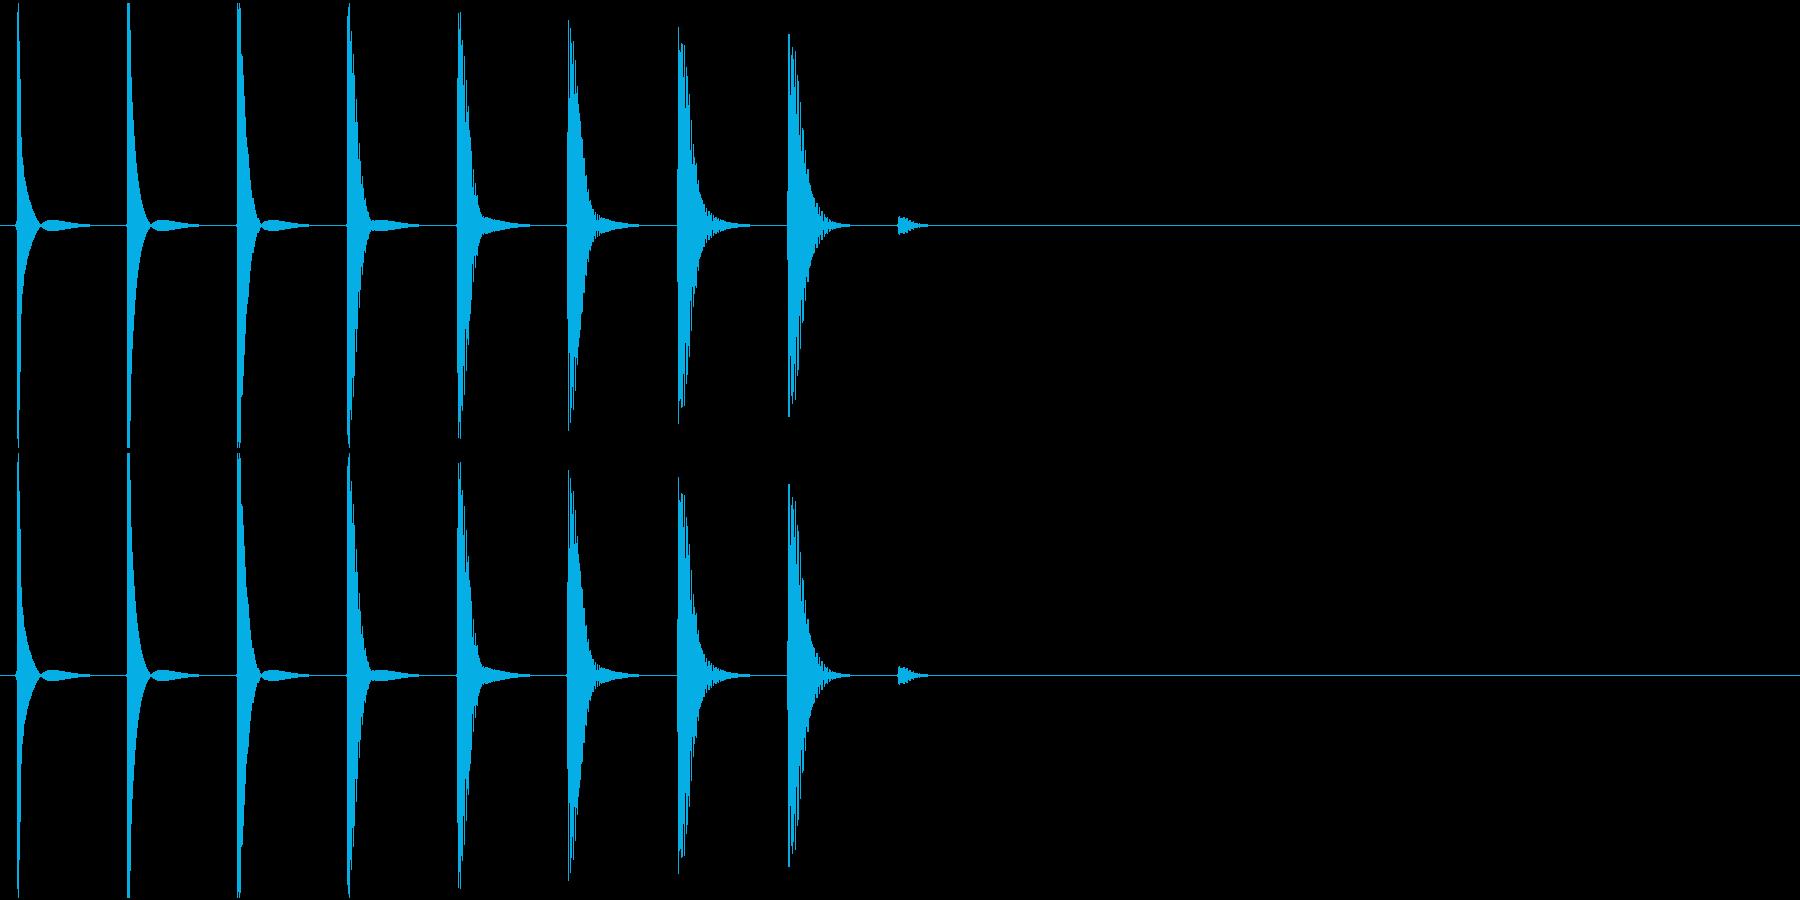 SE トホホ・・・ ミステイク音 呆れの再生済みの波形